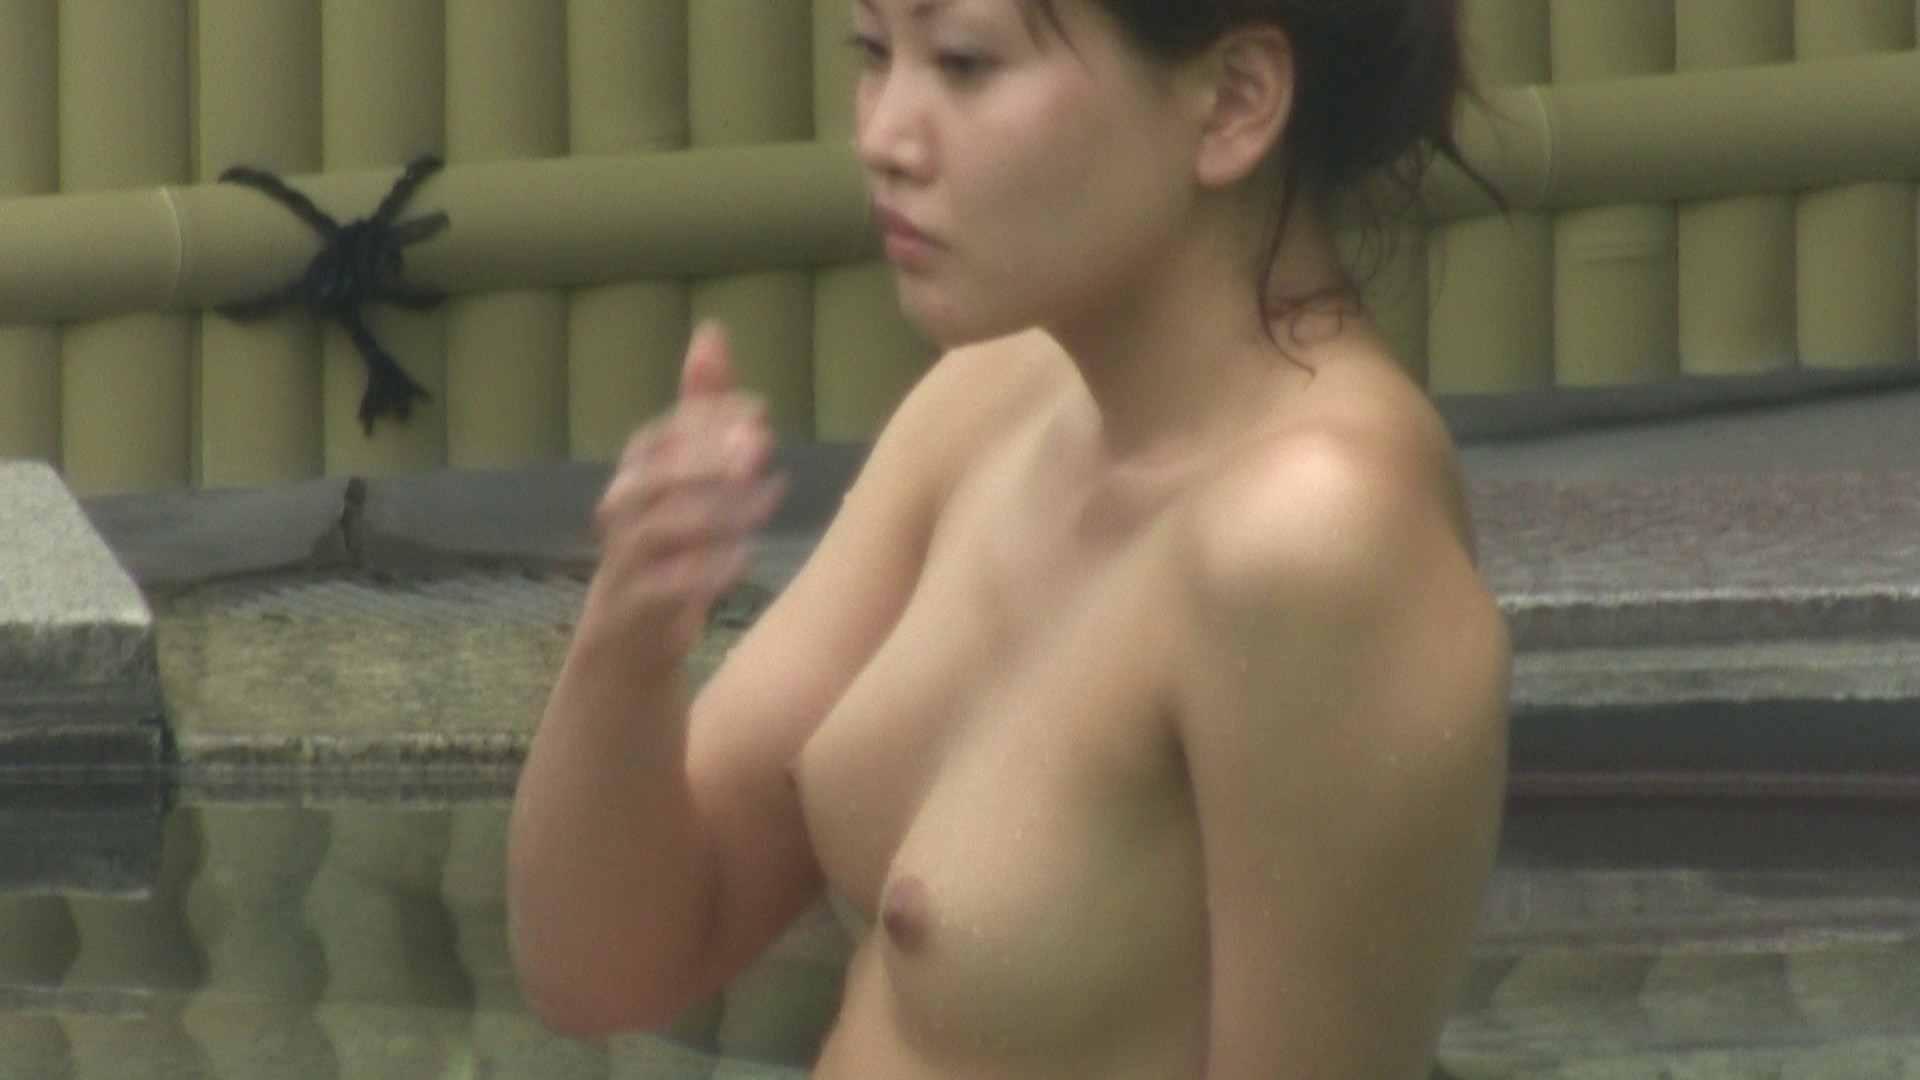 Aquaな露天風呂Vol.125 盗撮映像  22Pix 19